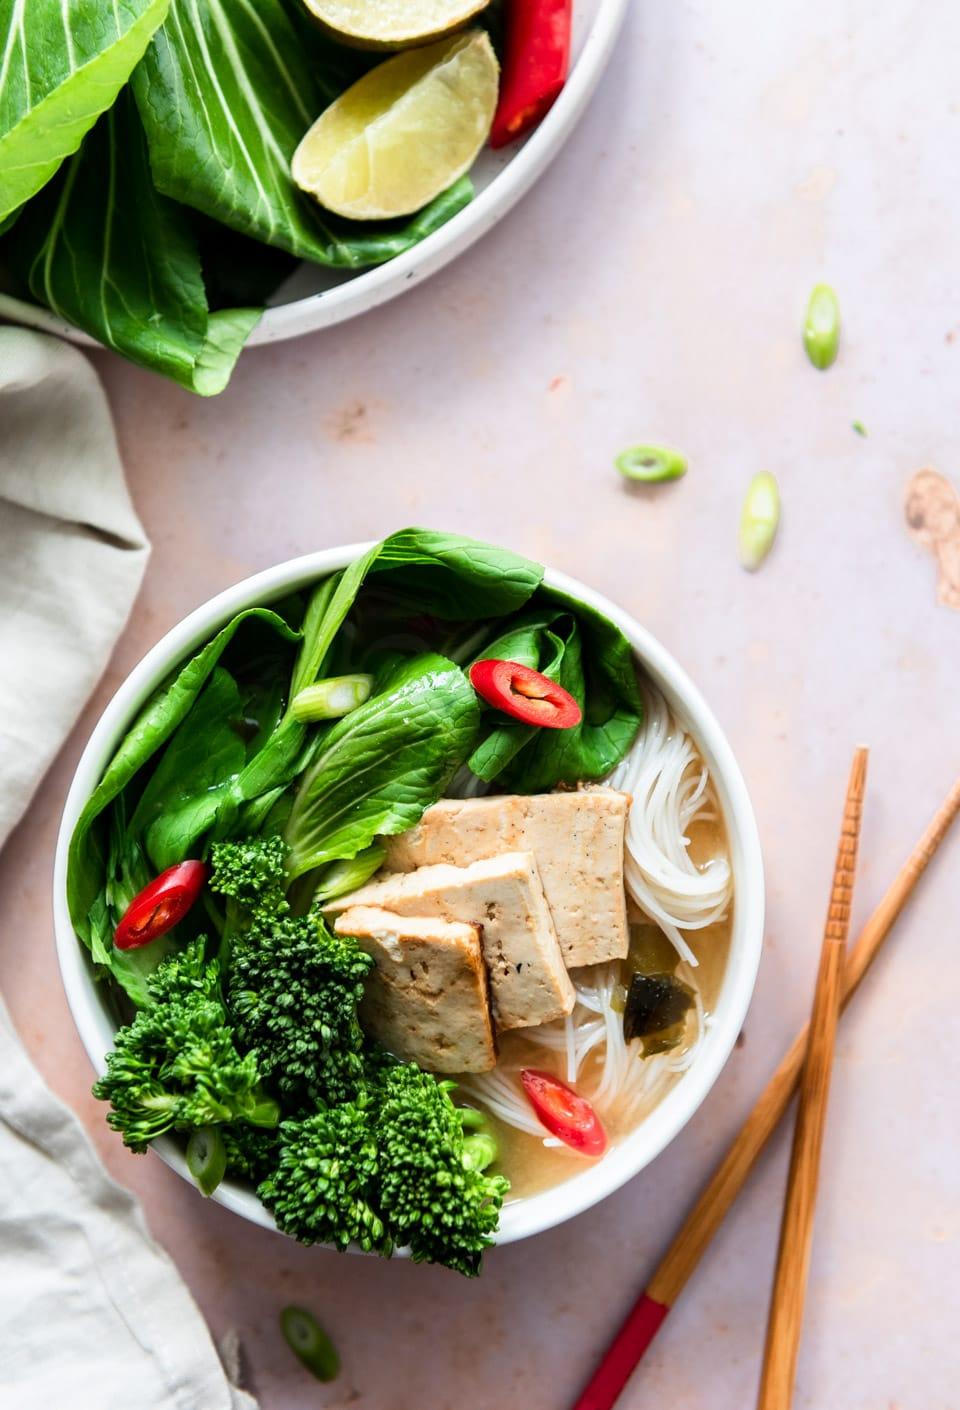 Vegan noedelsoep met gebakken tofu